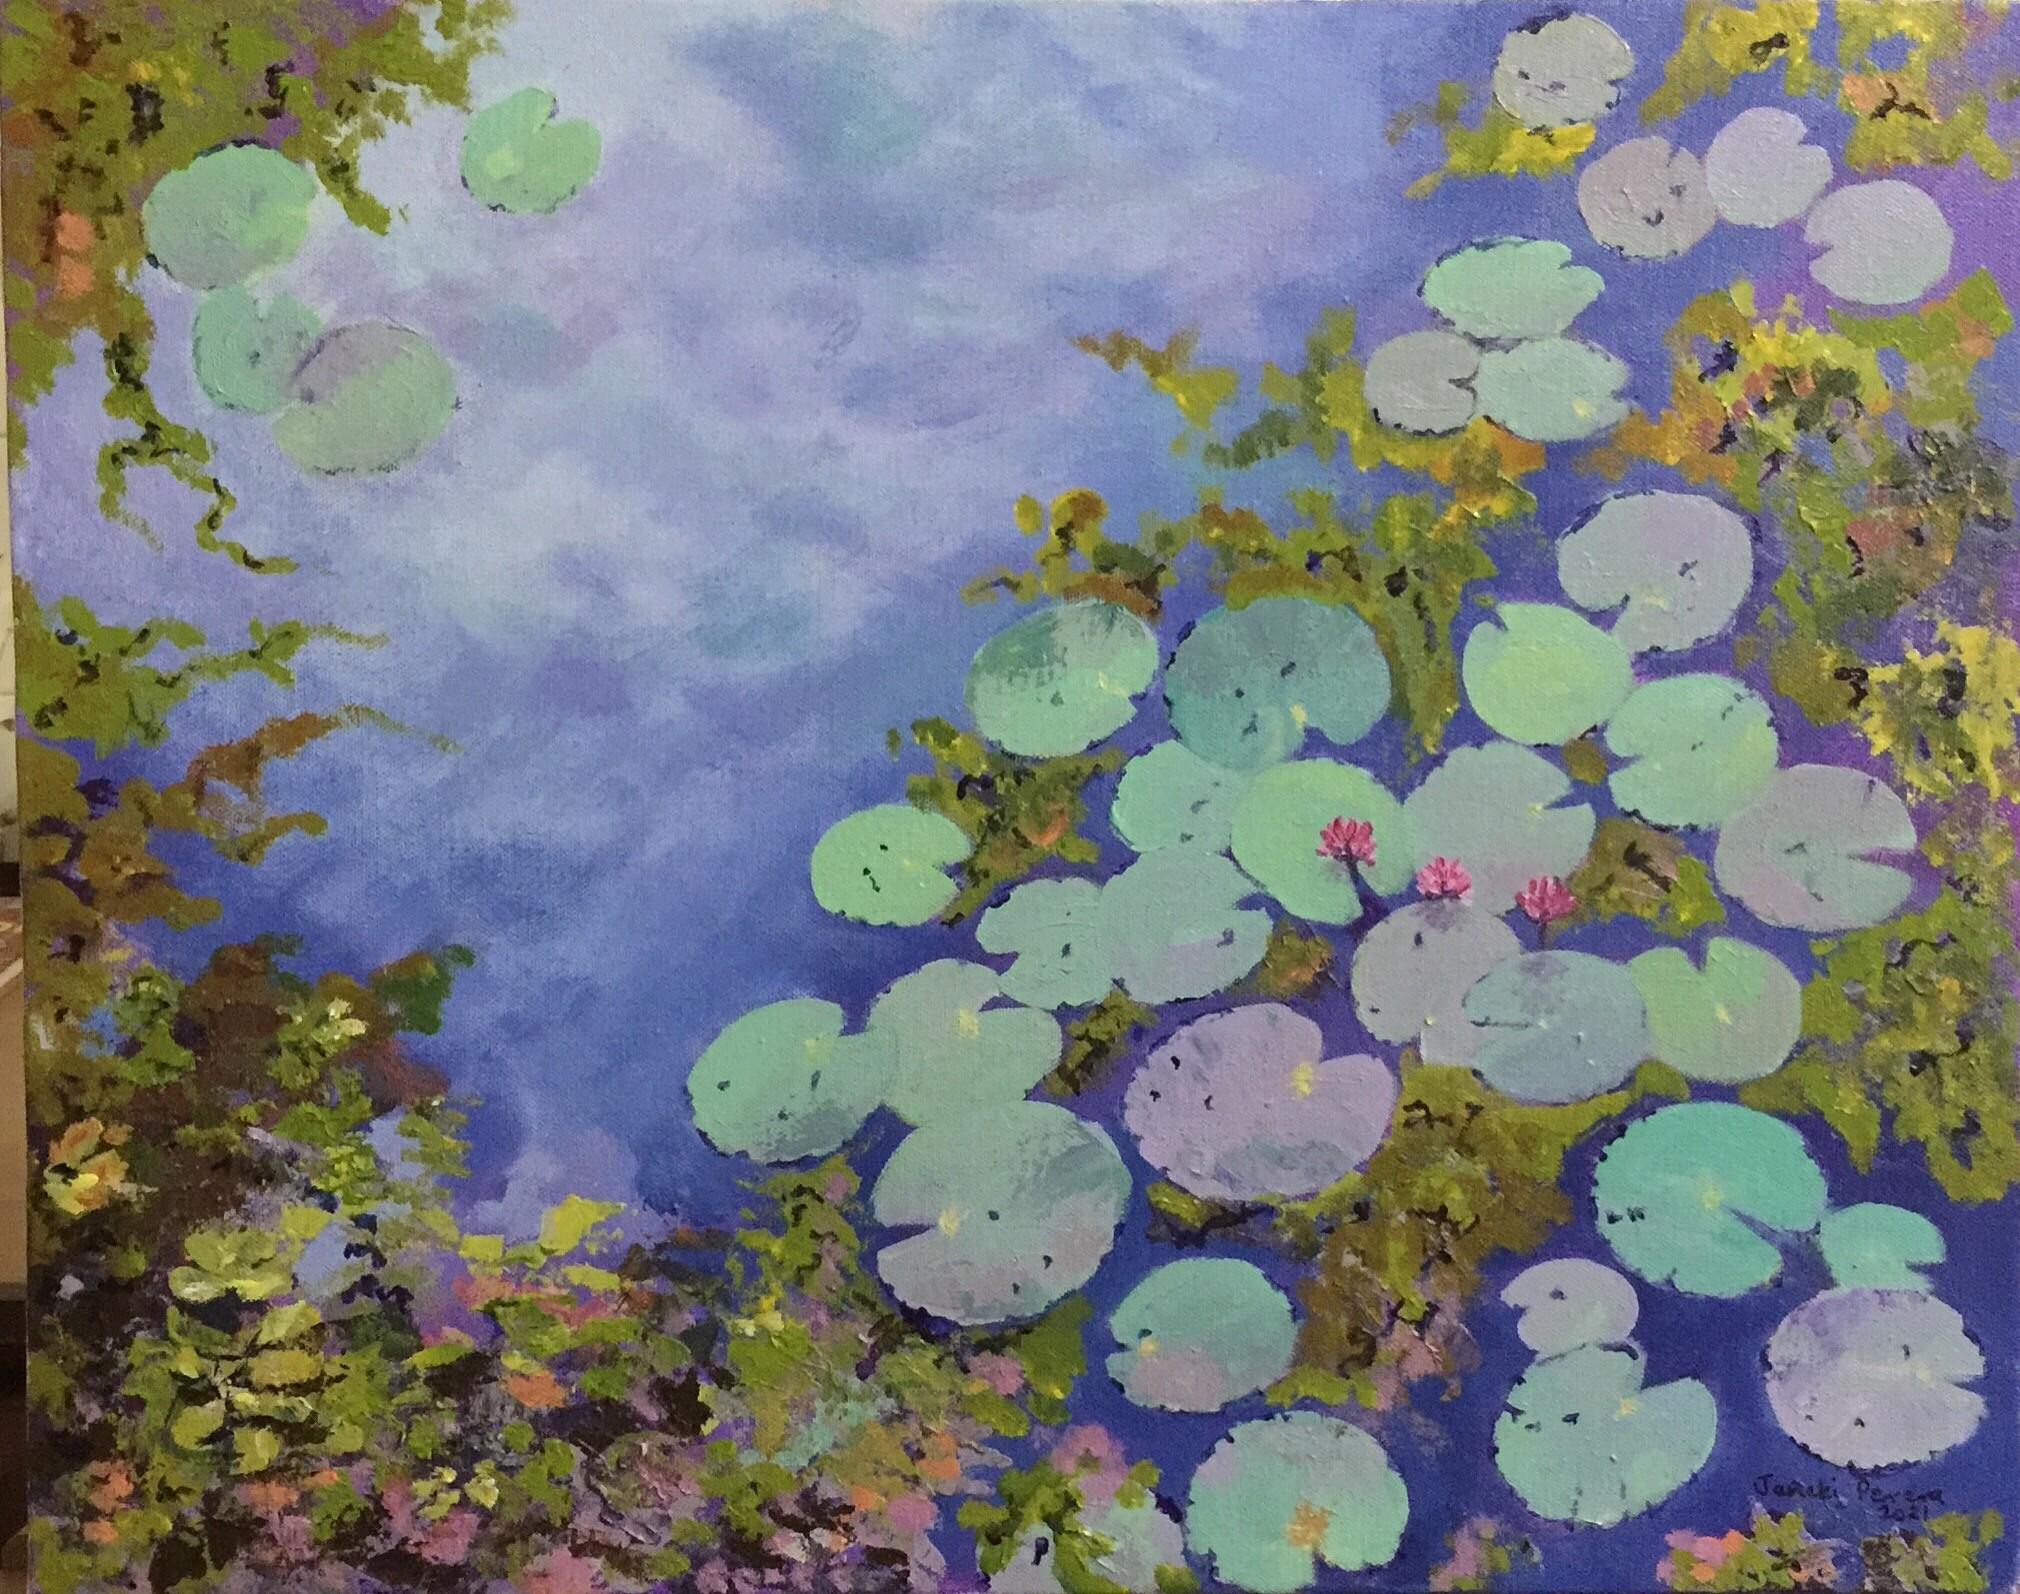 Diyawanna Oya lotuses by Janaki Perera